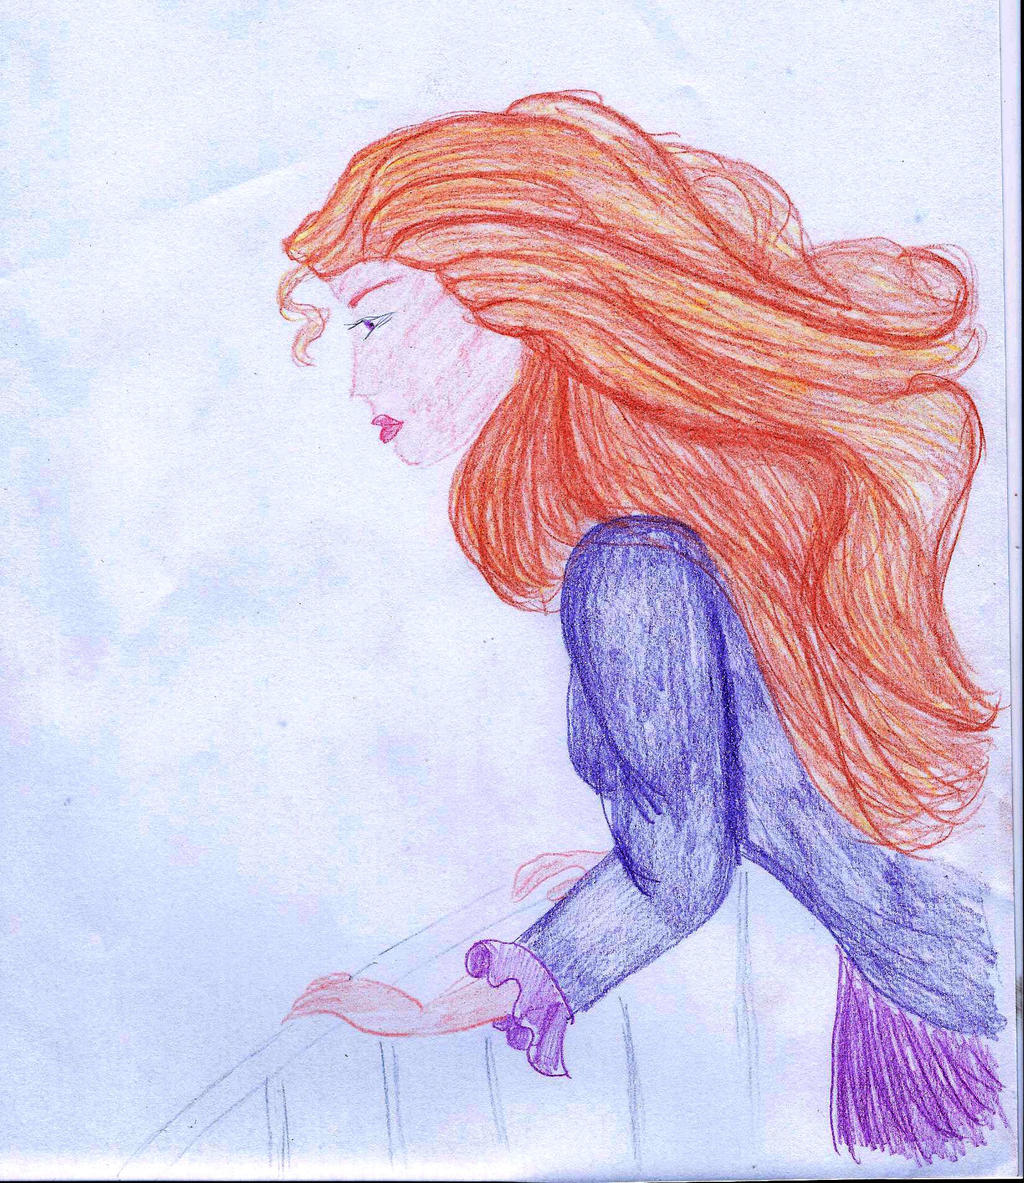 Anita Isolde Johnson by Nessie222